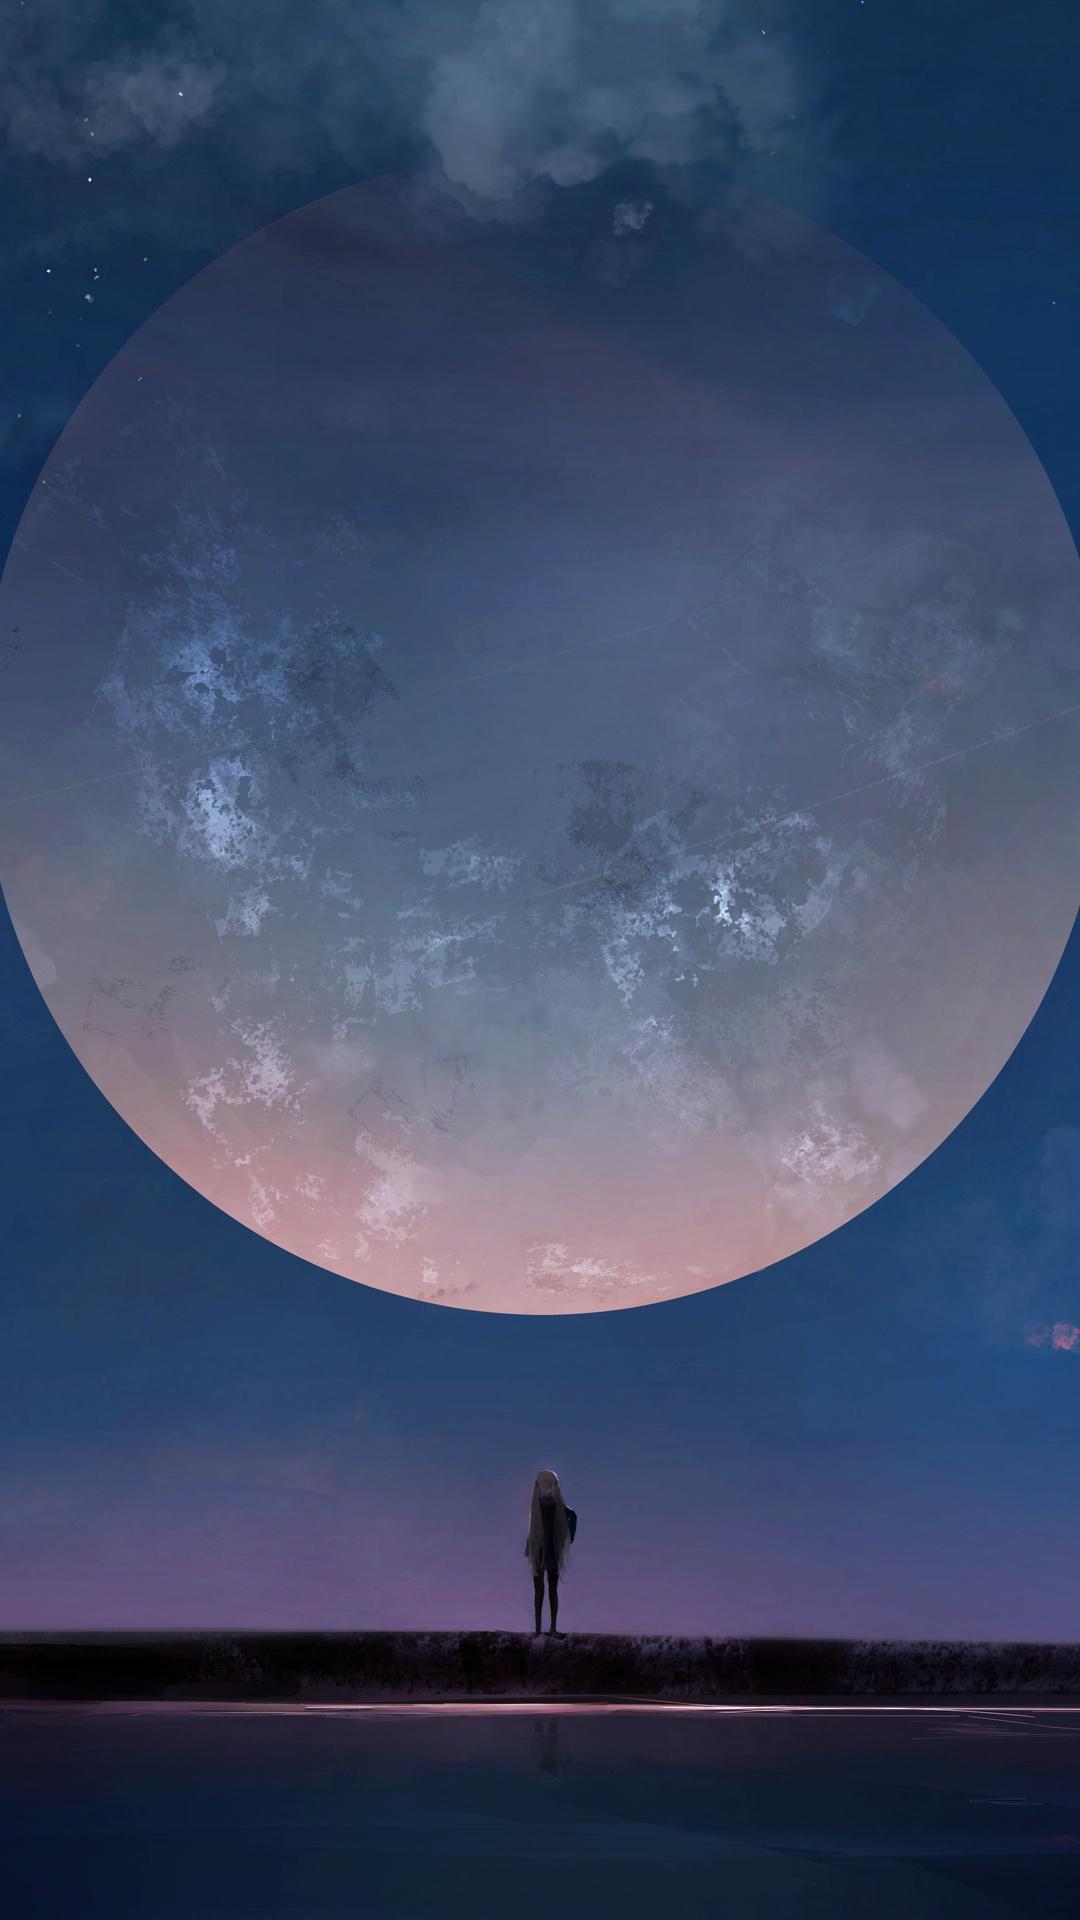 1080x1920 Huge Moon Anime Girl Night Sky Stars Iphone 7 6s 6